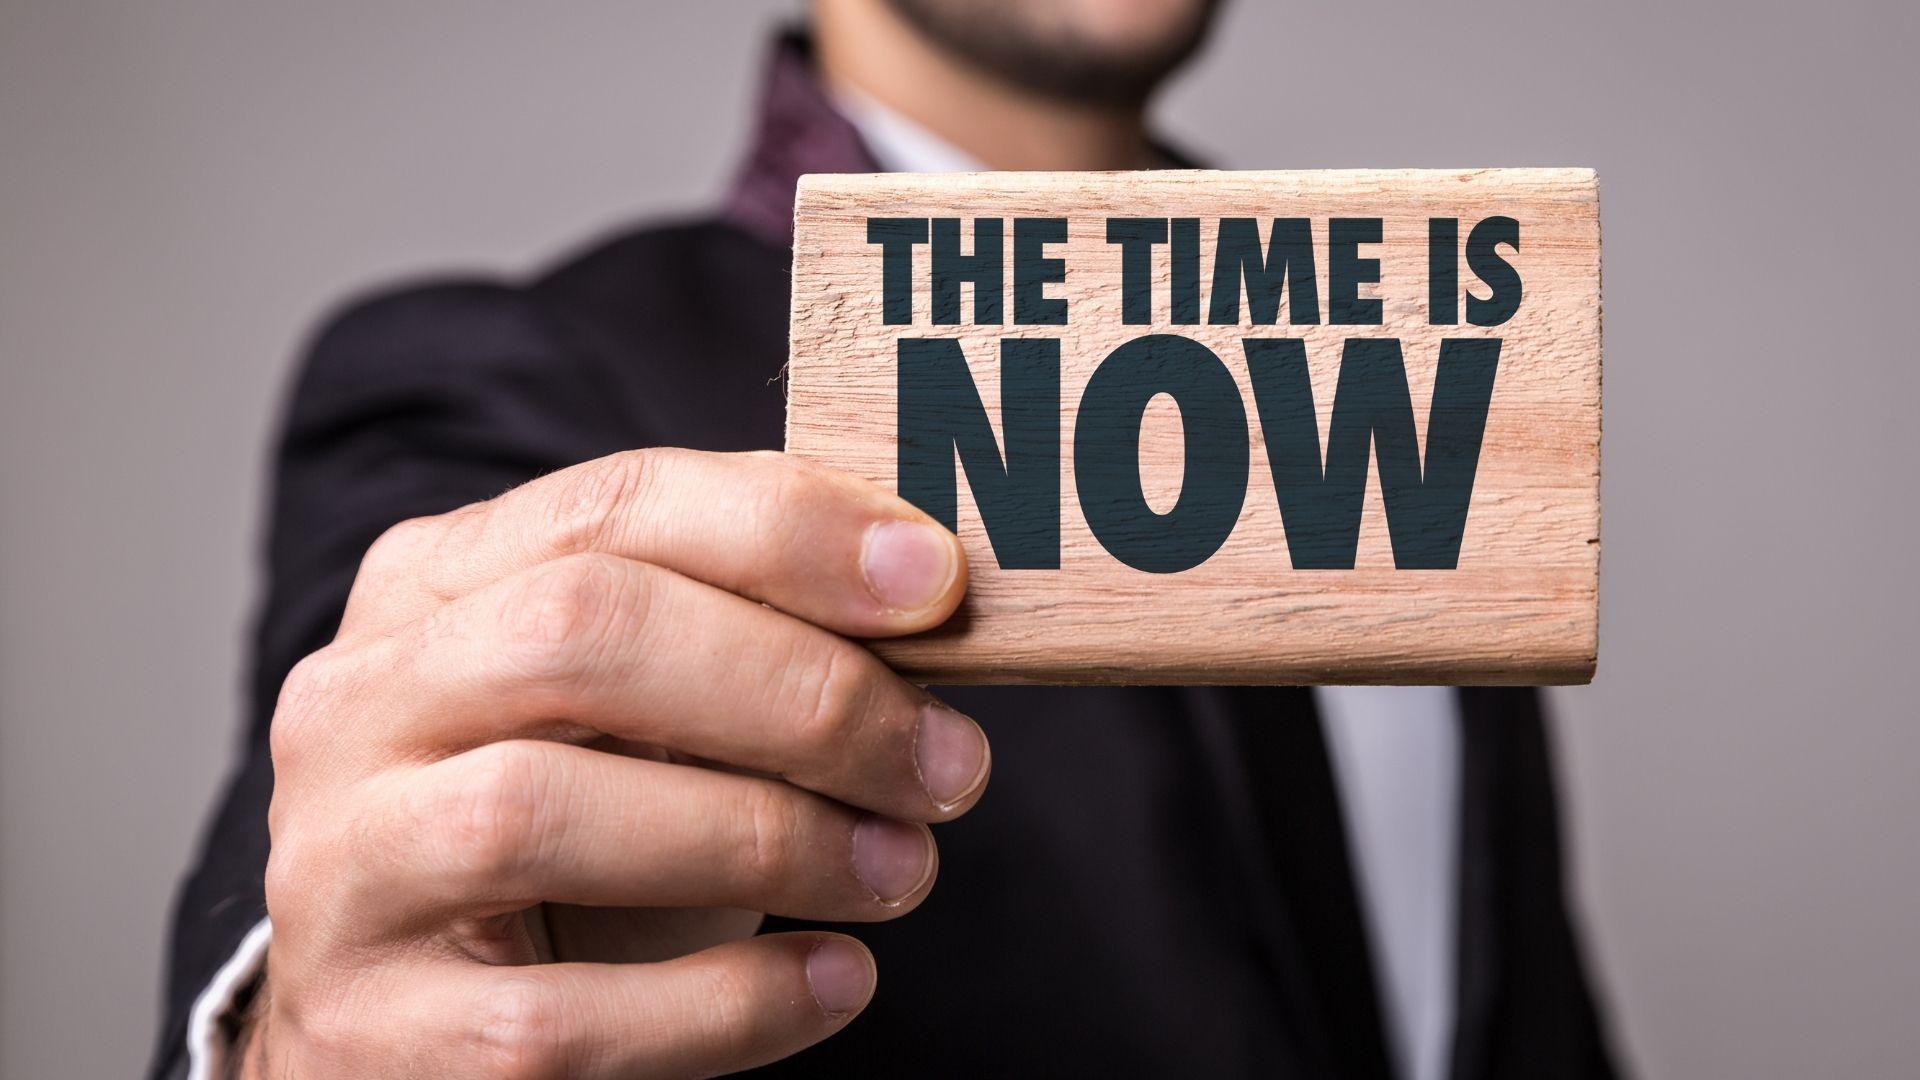 TikTok time is now